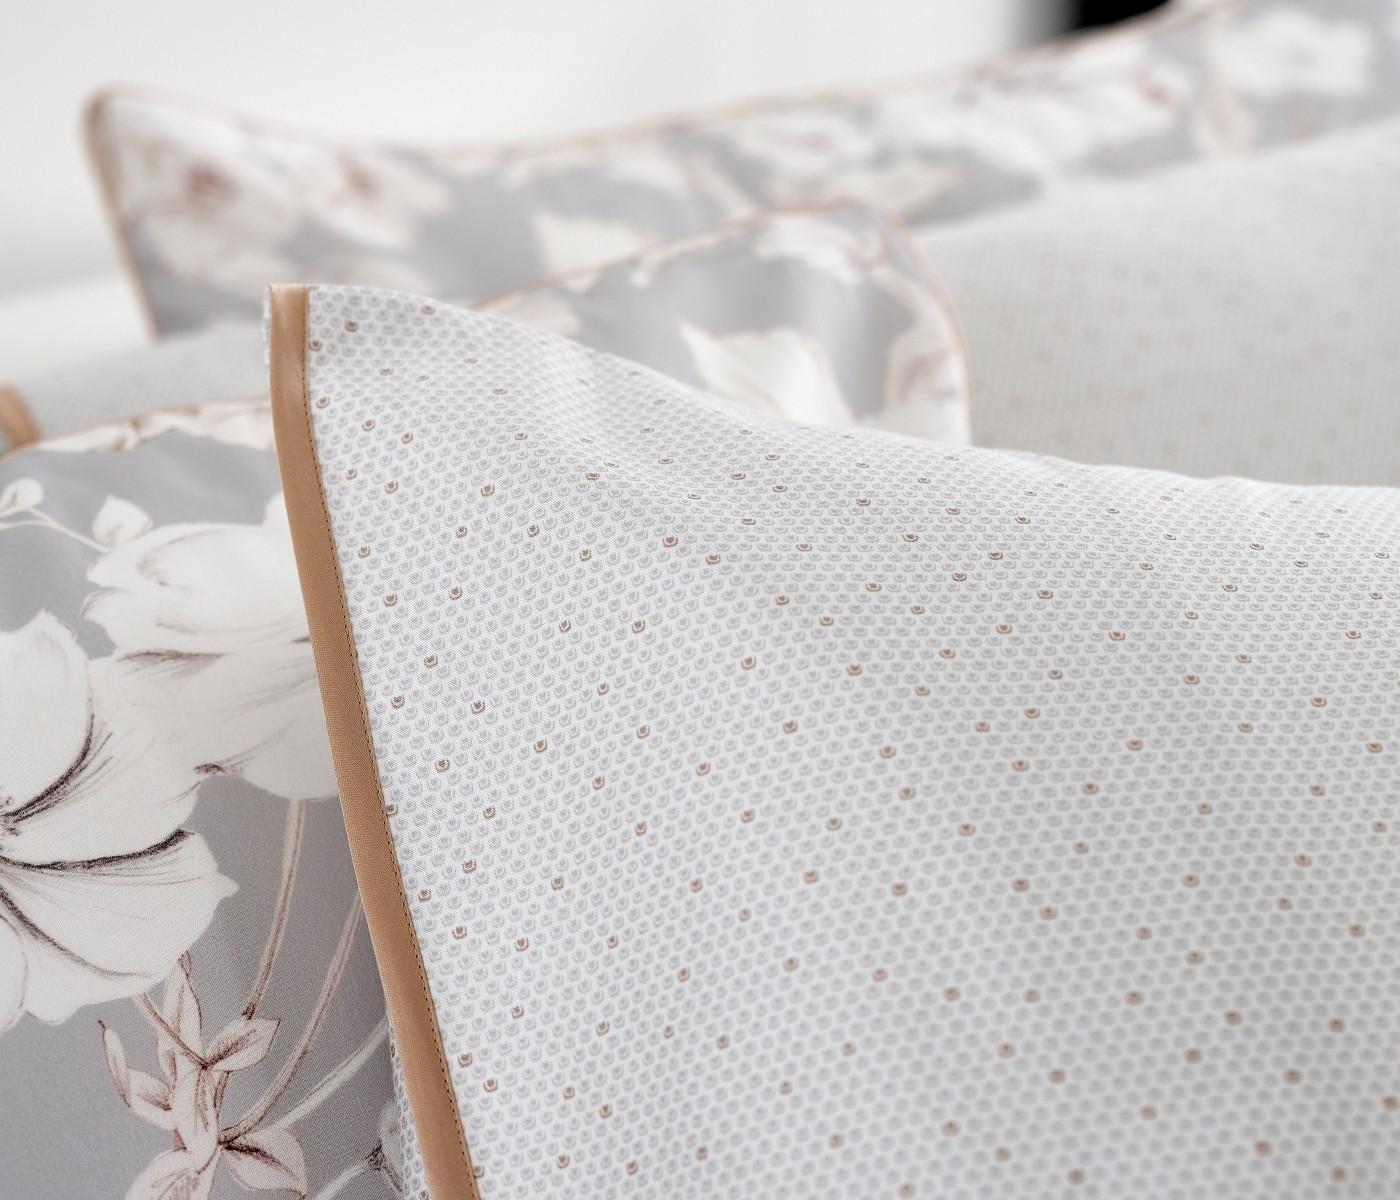 Sheet Set LOTUS Cotton Satin, LAMEIRINHO